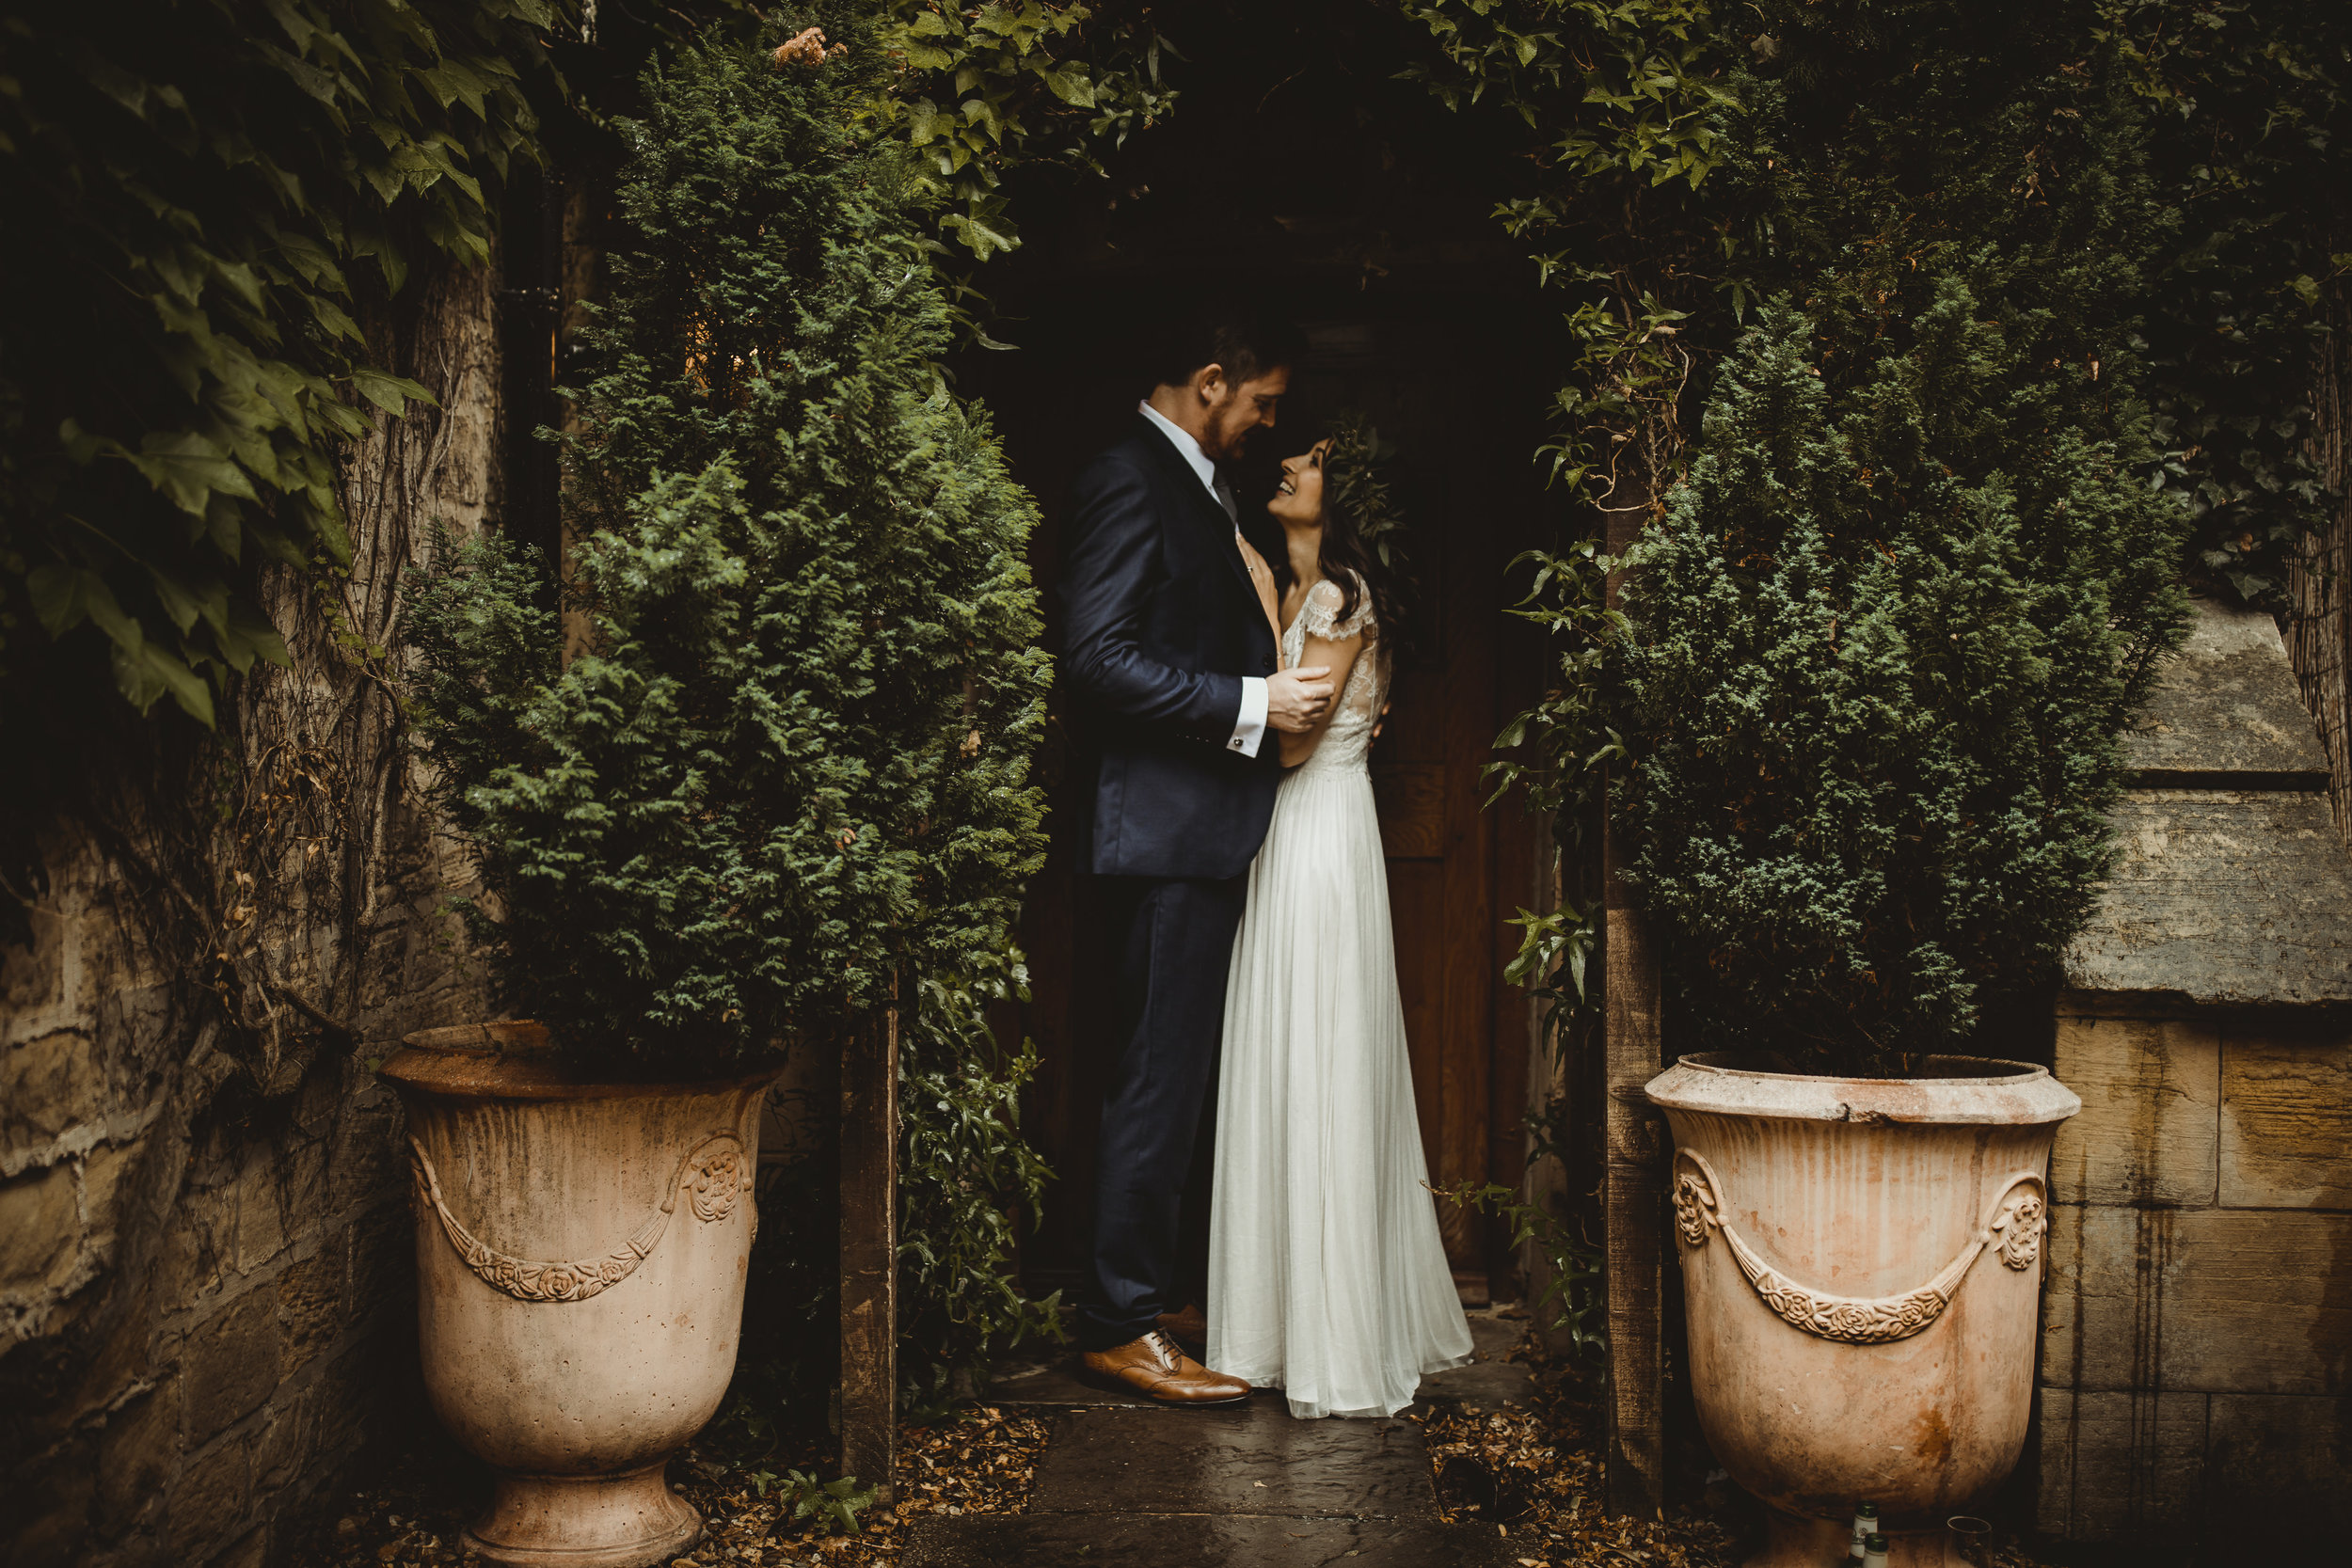 N&J_YORKSHIRE_WEDDING_PHOTOGRAPHER_MALTON_LEEDS_SHEFFIELD-589.JPG